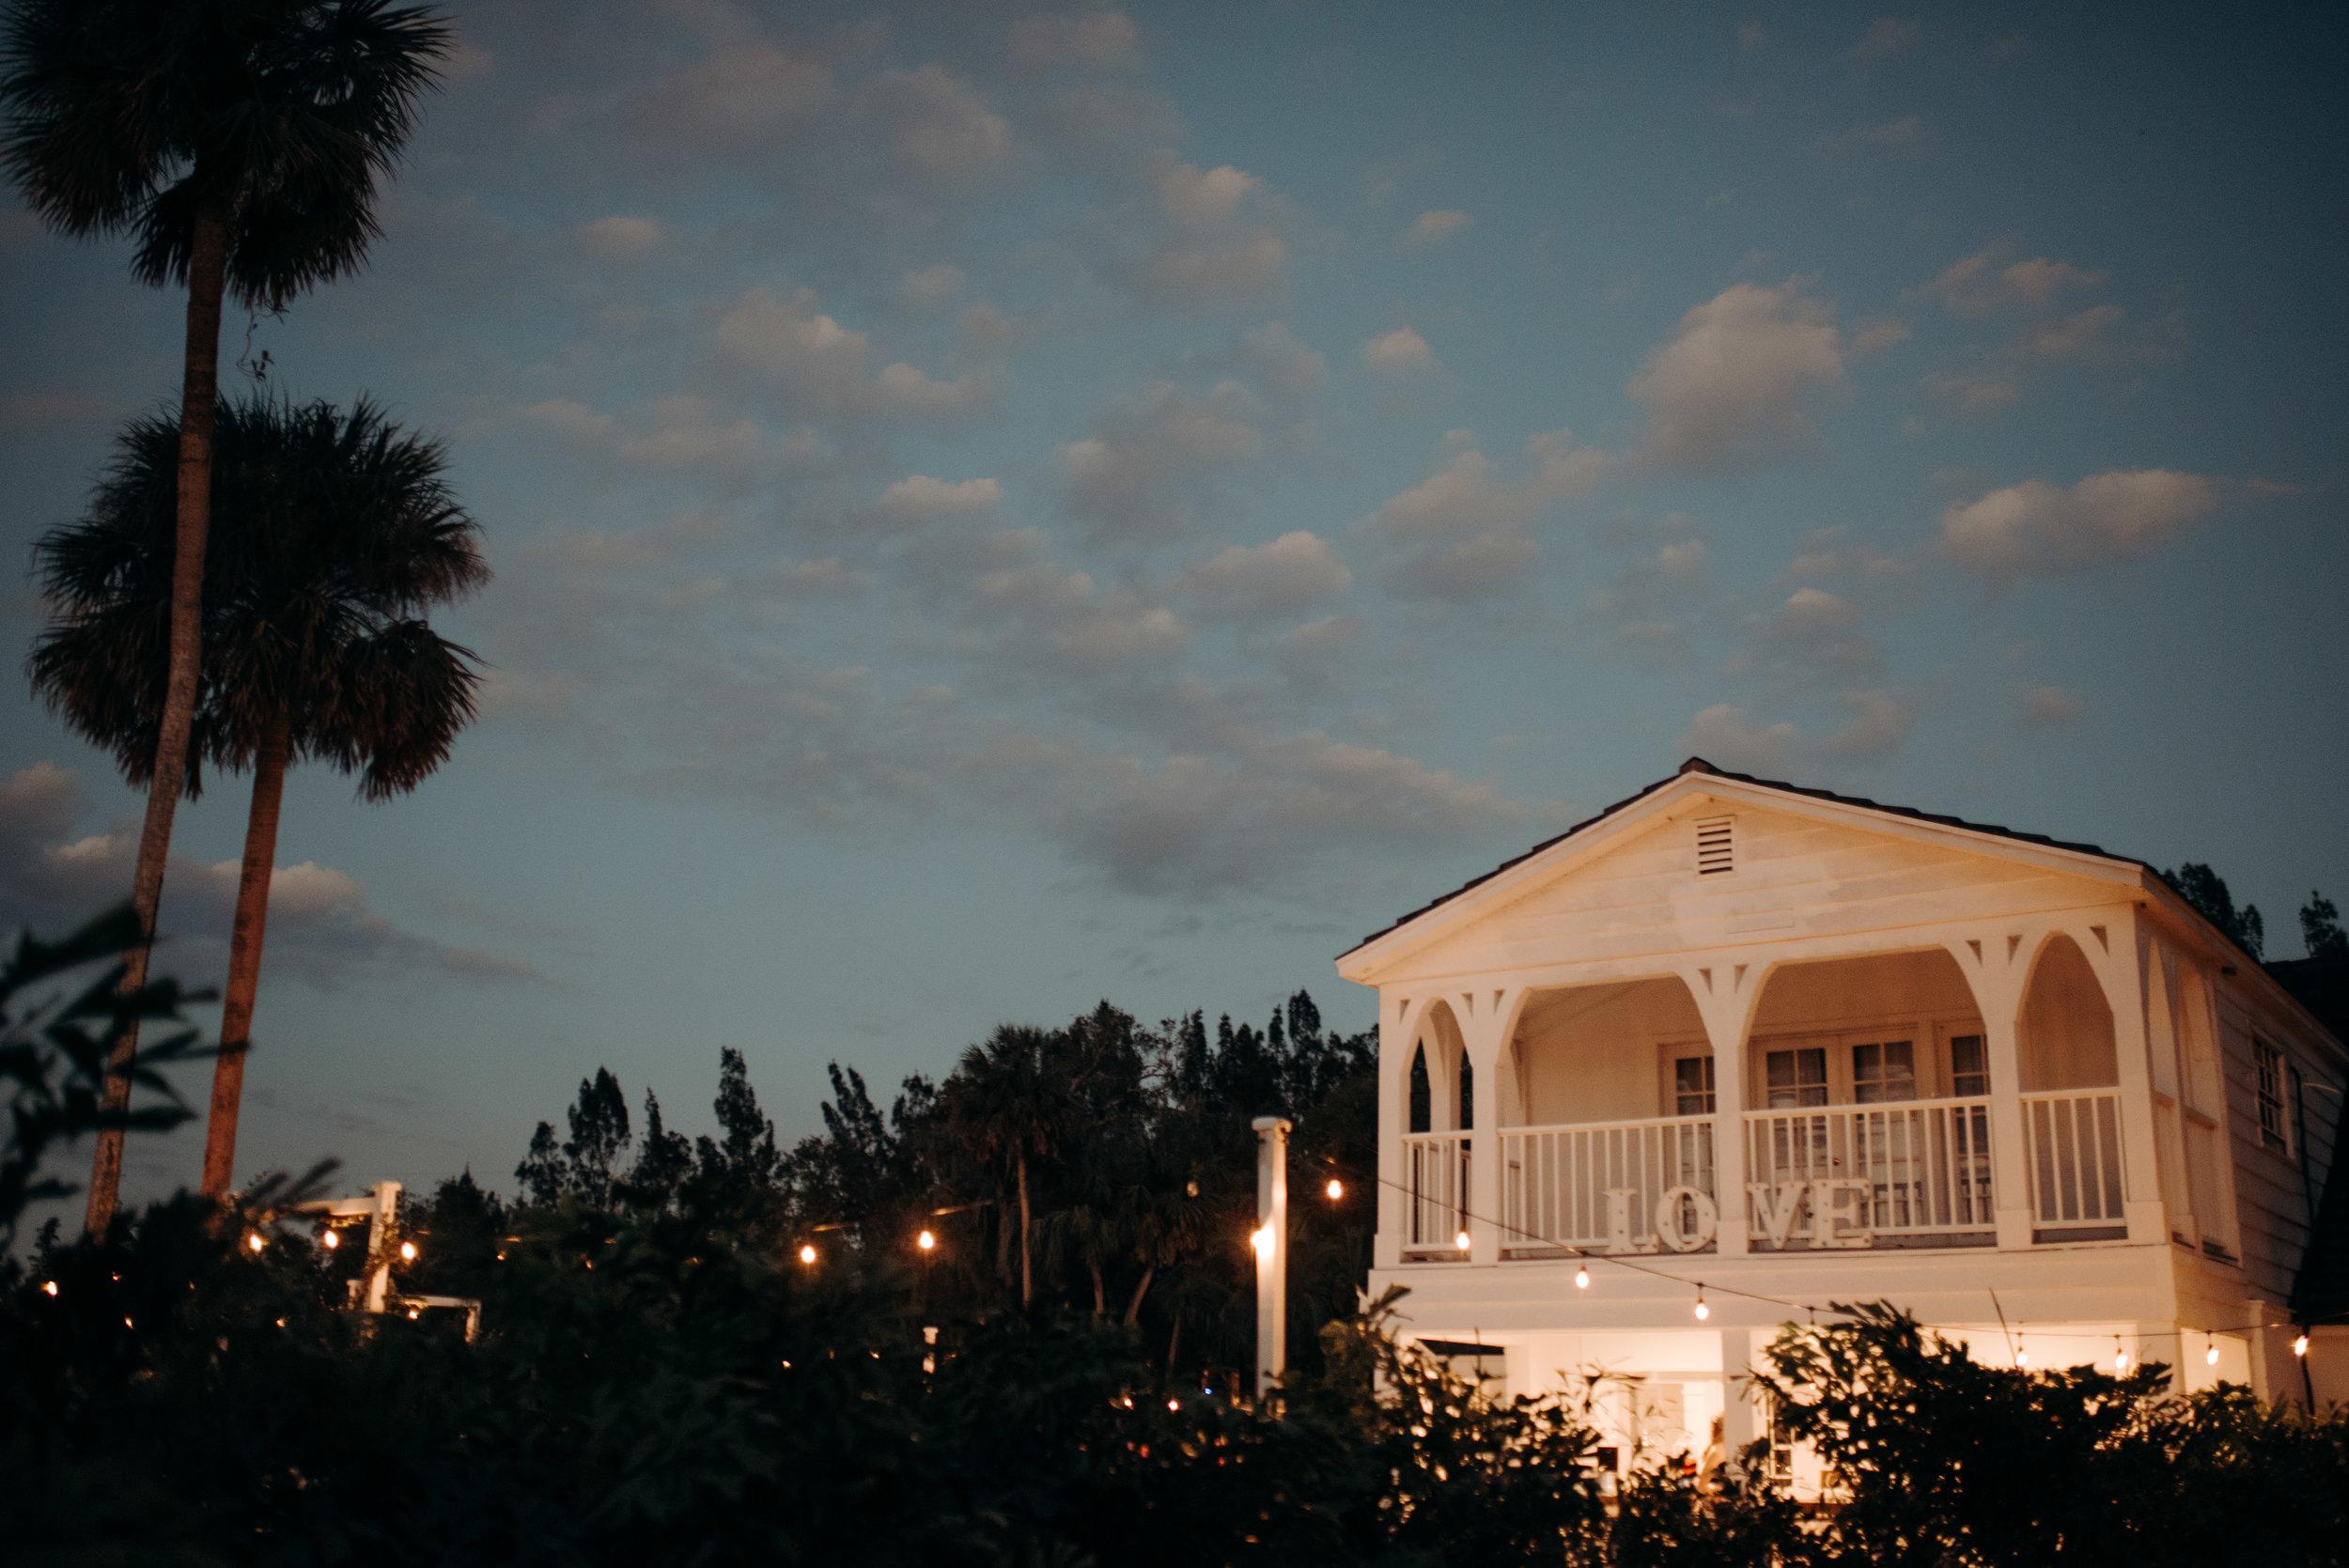 micayla-greyson-neumann-vero-beach-lake-house-winter-white-wedding-photography-1127.jpg